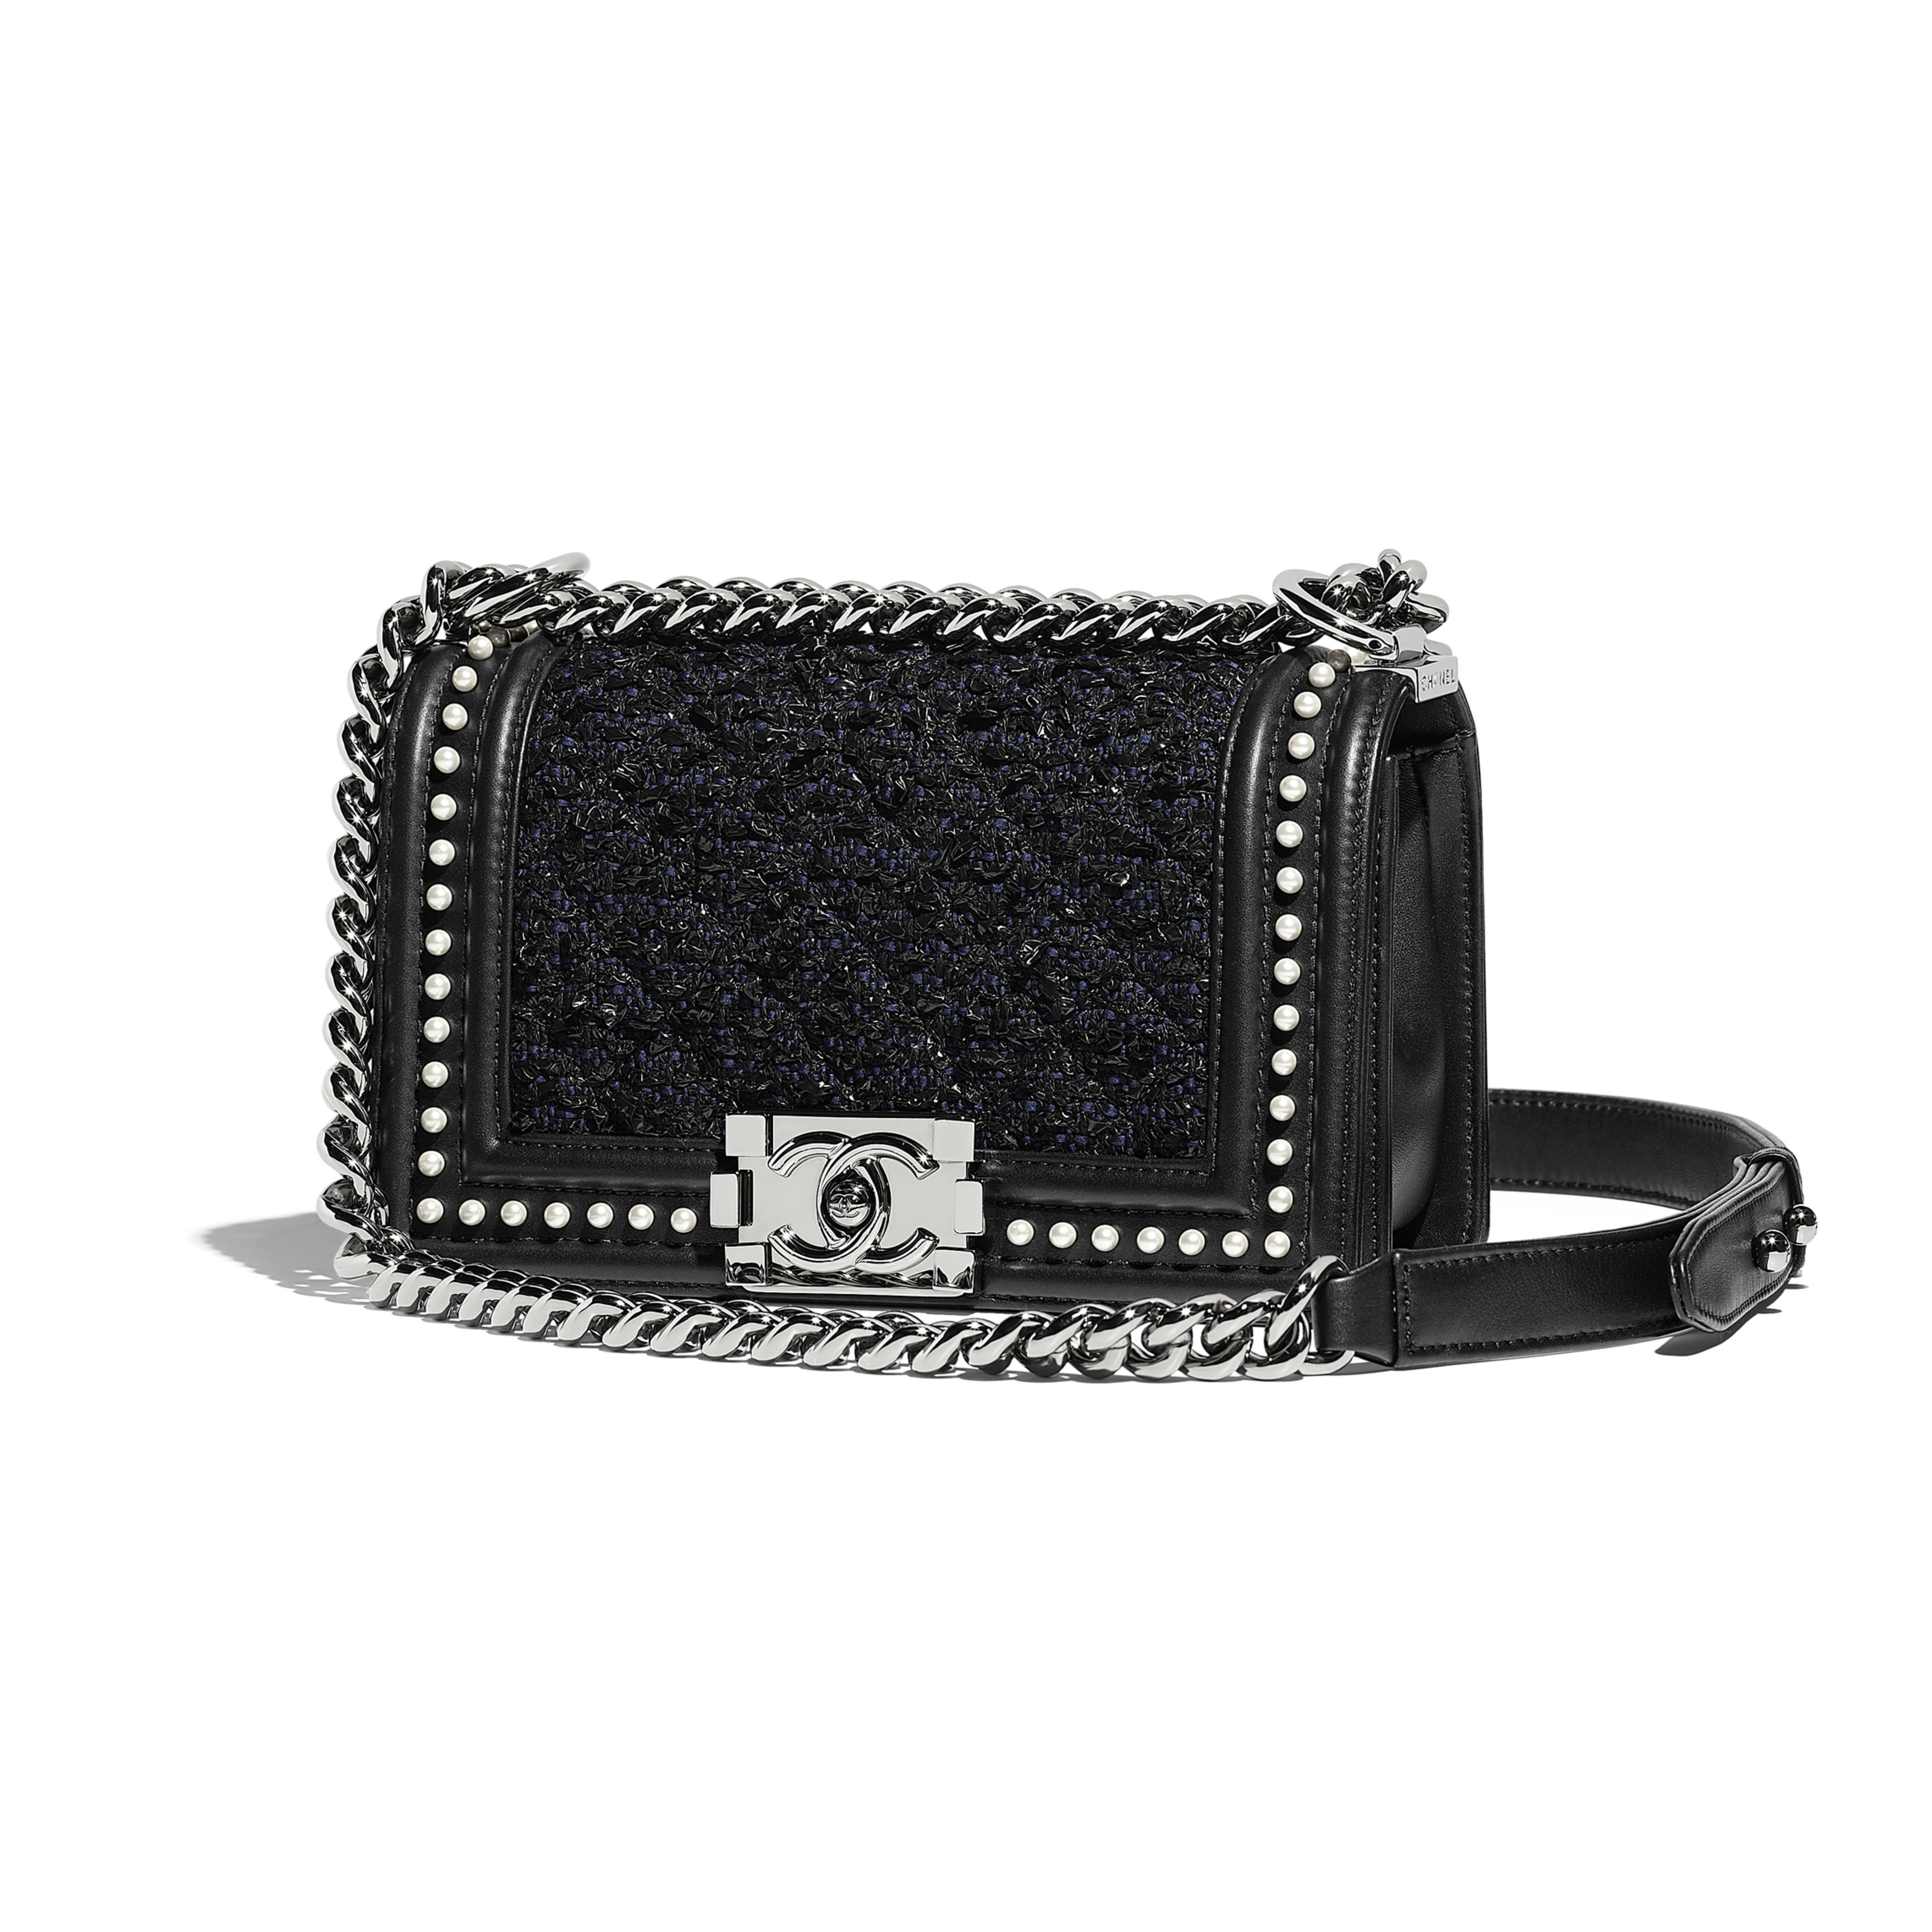 Small BOY CHANEL Handbag - Black & Navy Blue - Tweed, Calfskin, Imitation Pearls & Ruthenium-Finish Metal - Default view - see full sized version